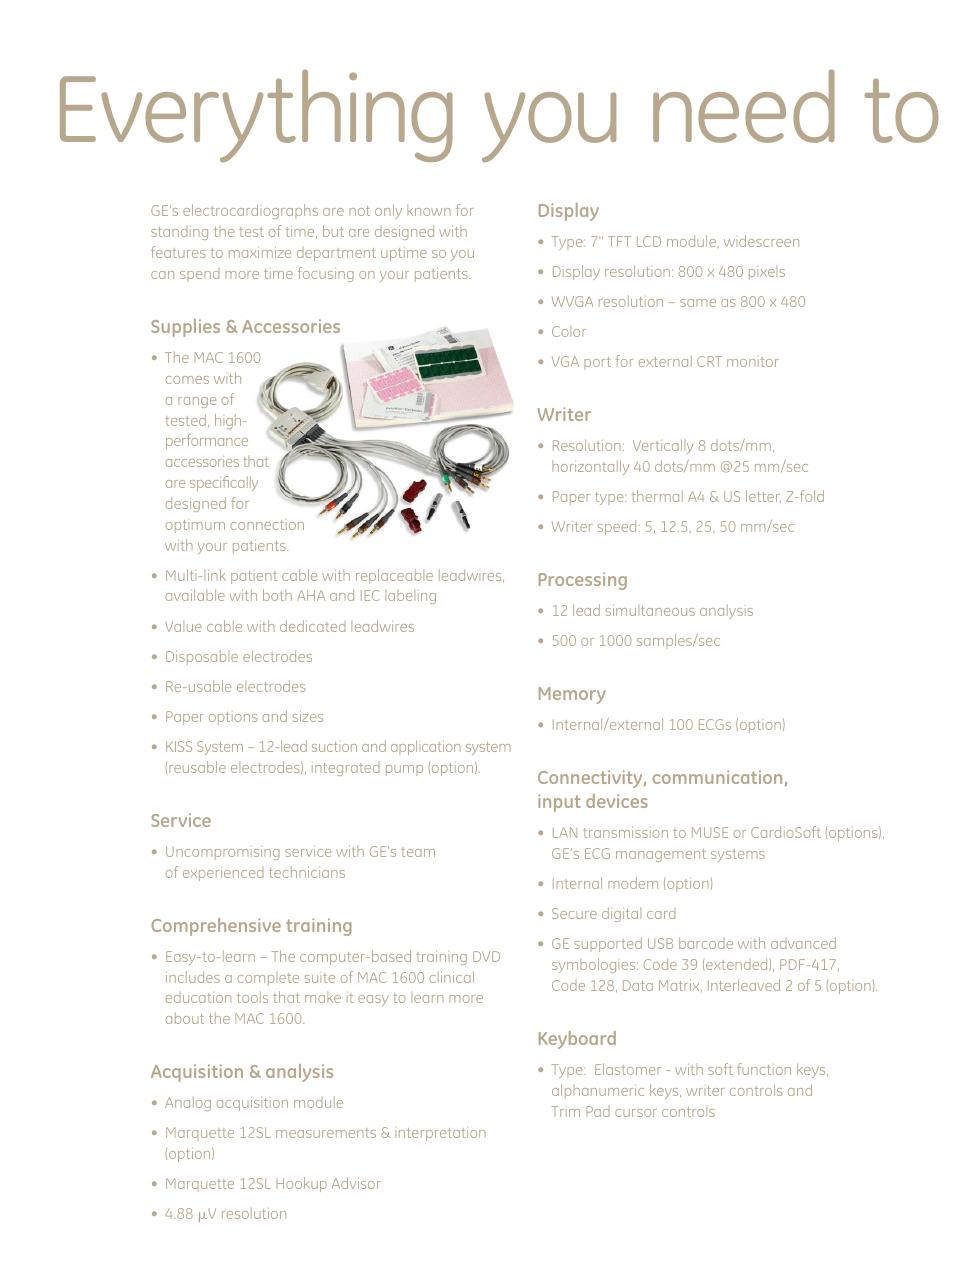 everything you need to stay productive ge healthcare mac 1600 ecg rh manualsdir com GE Medical ge mac 1600 user manual